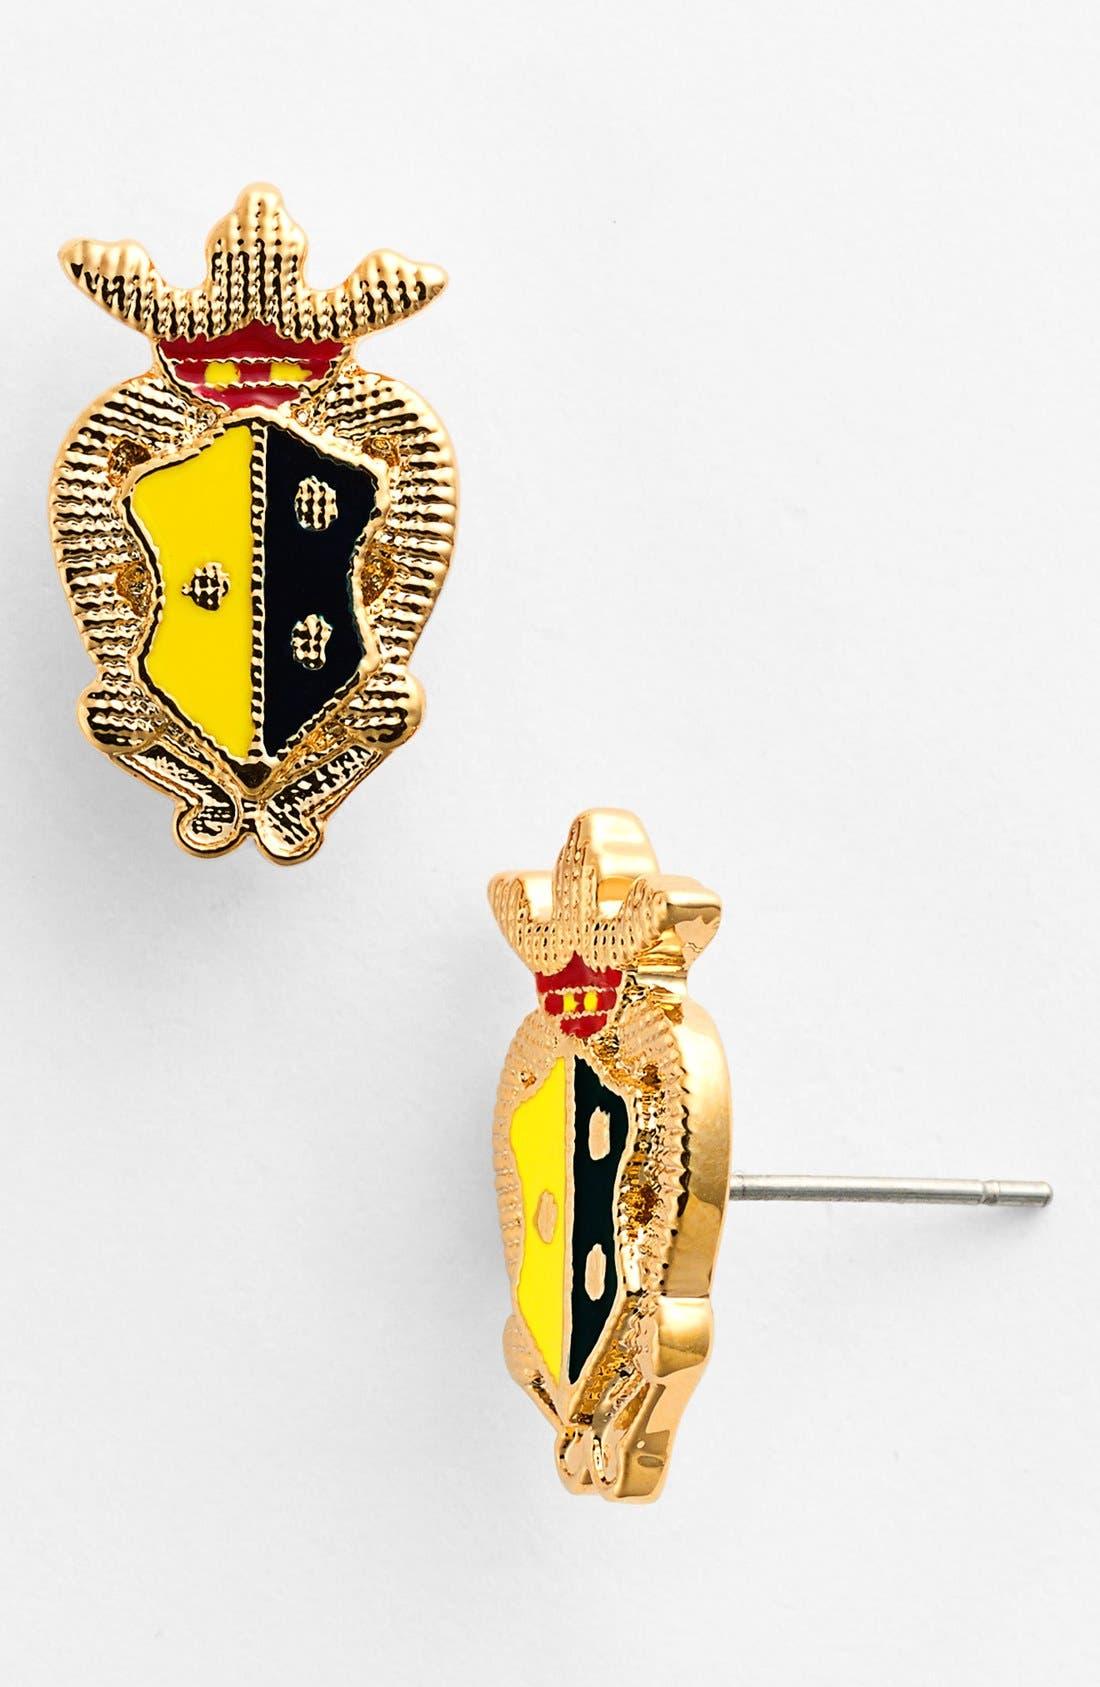 Alternate Image 1 Selected - Tory Burch 'Dellora' Stud Earrings